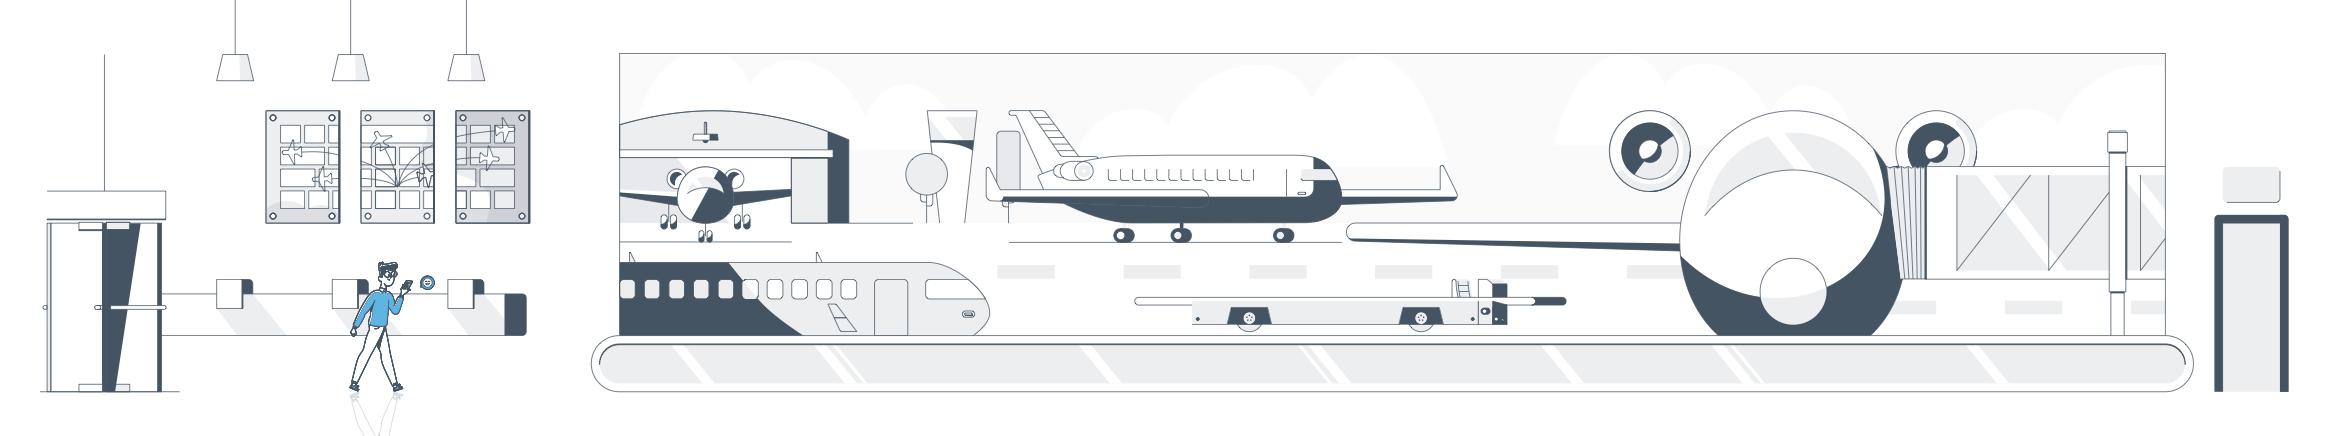 Full airport illustration